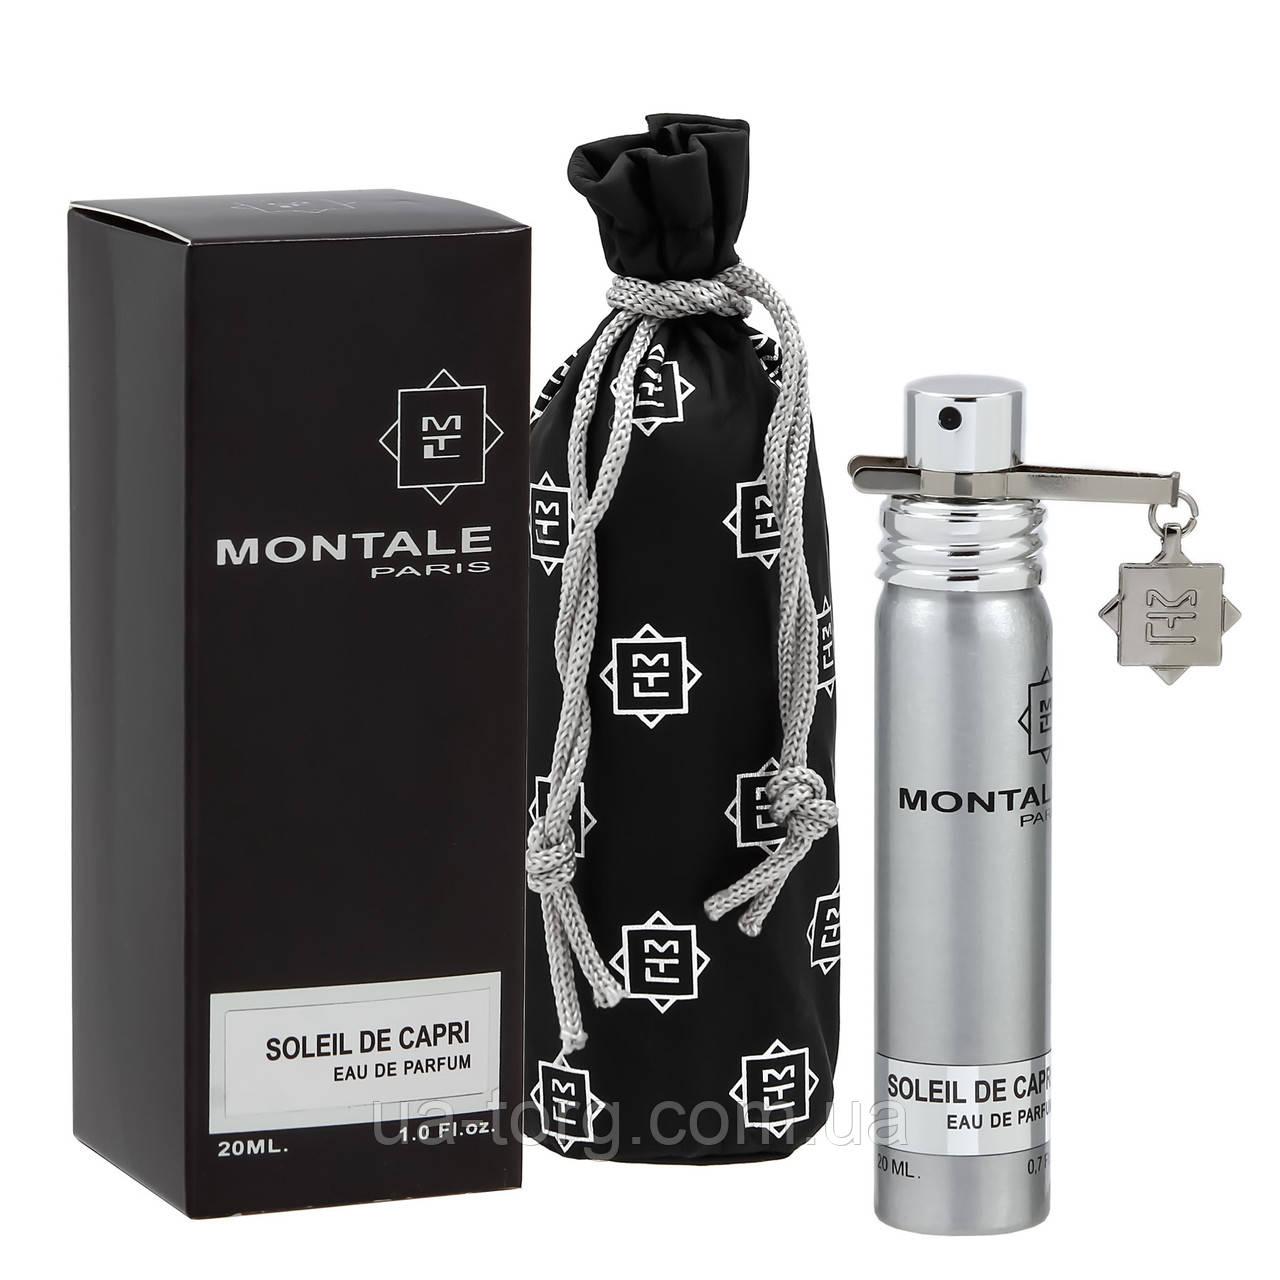 Унисекс мини-парфюм Montale Soleil de Capri20 мл